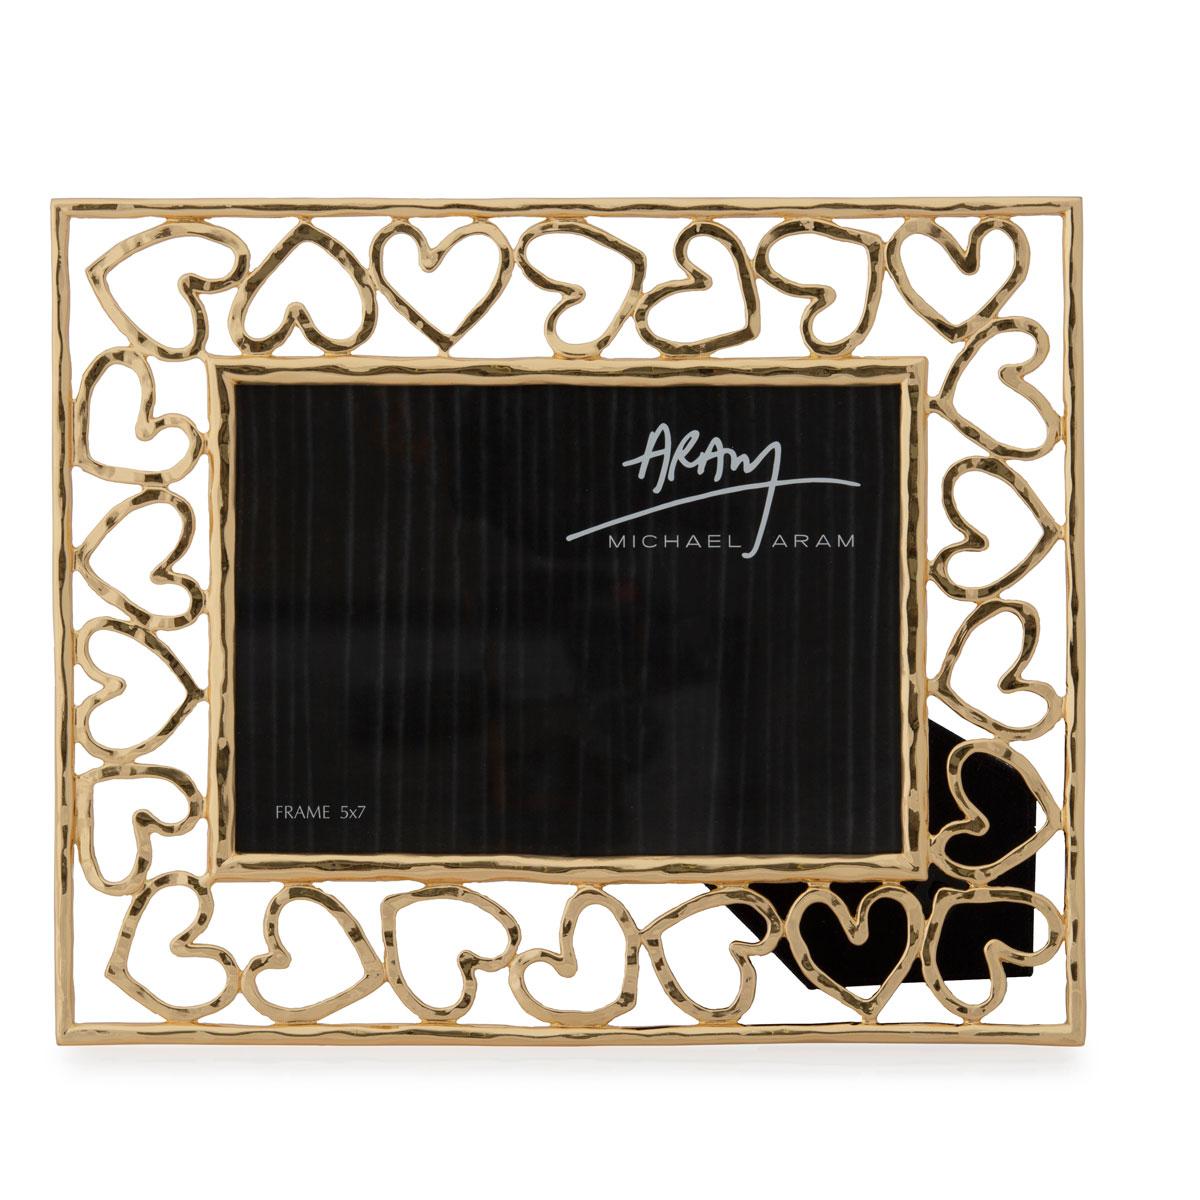 "Michael Aram Heart 5x7"" Picture Frame"